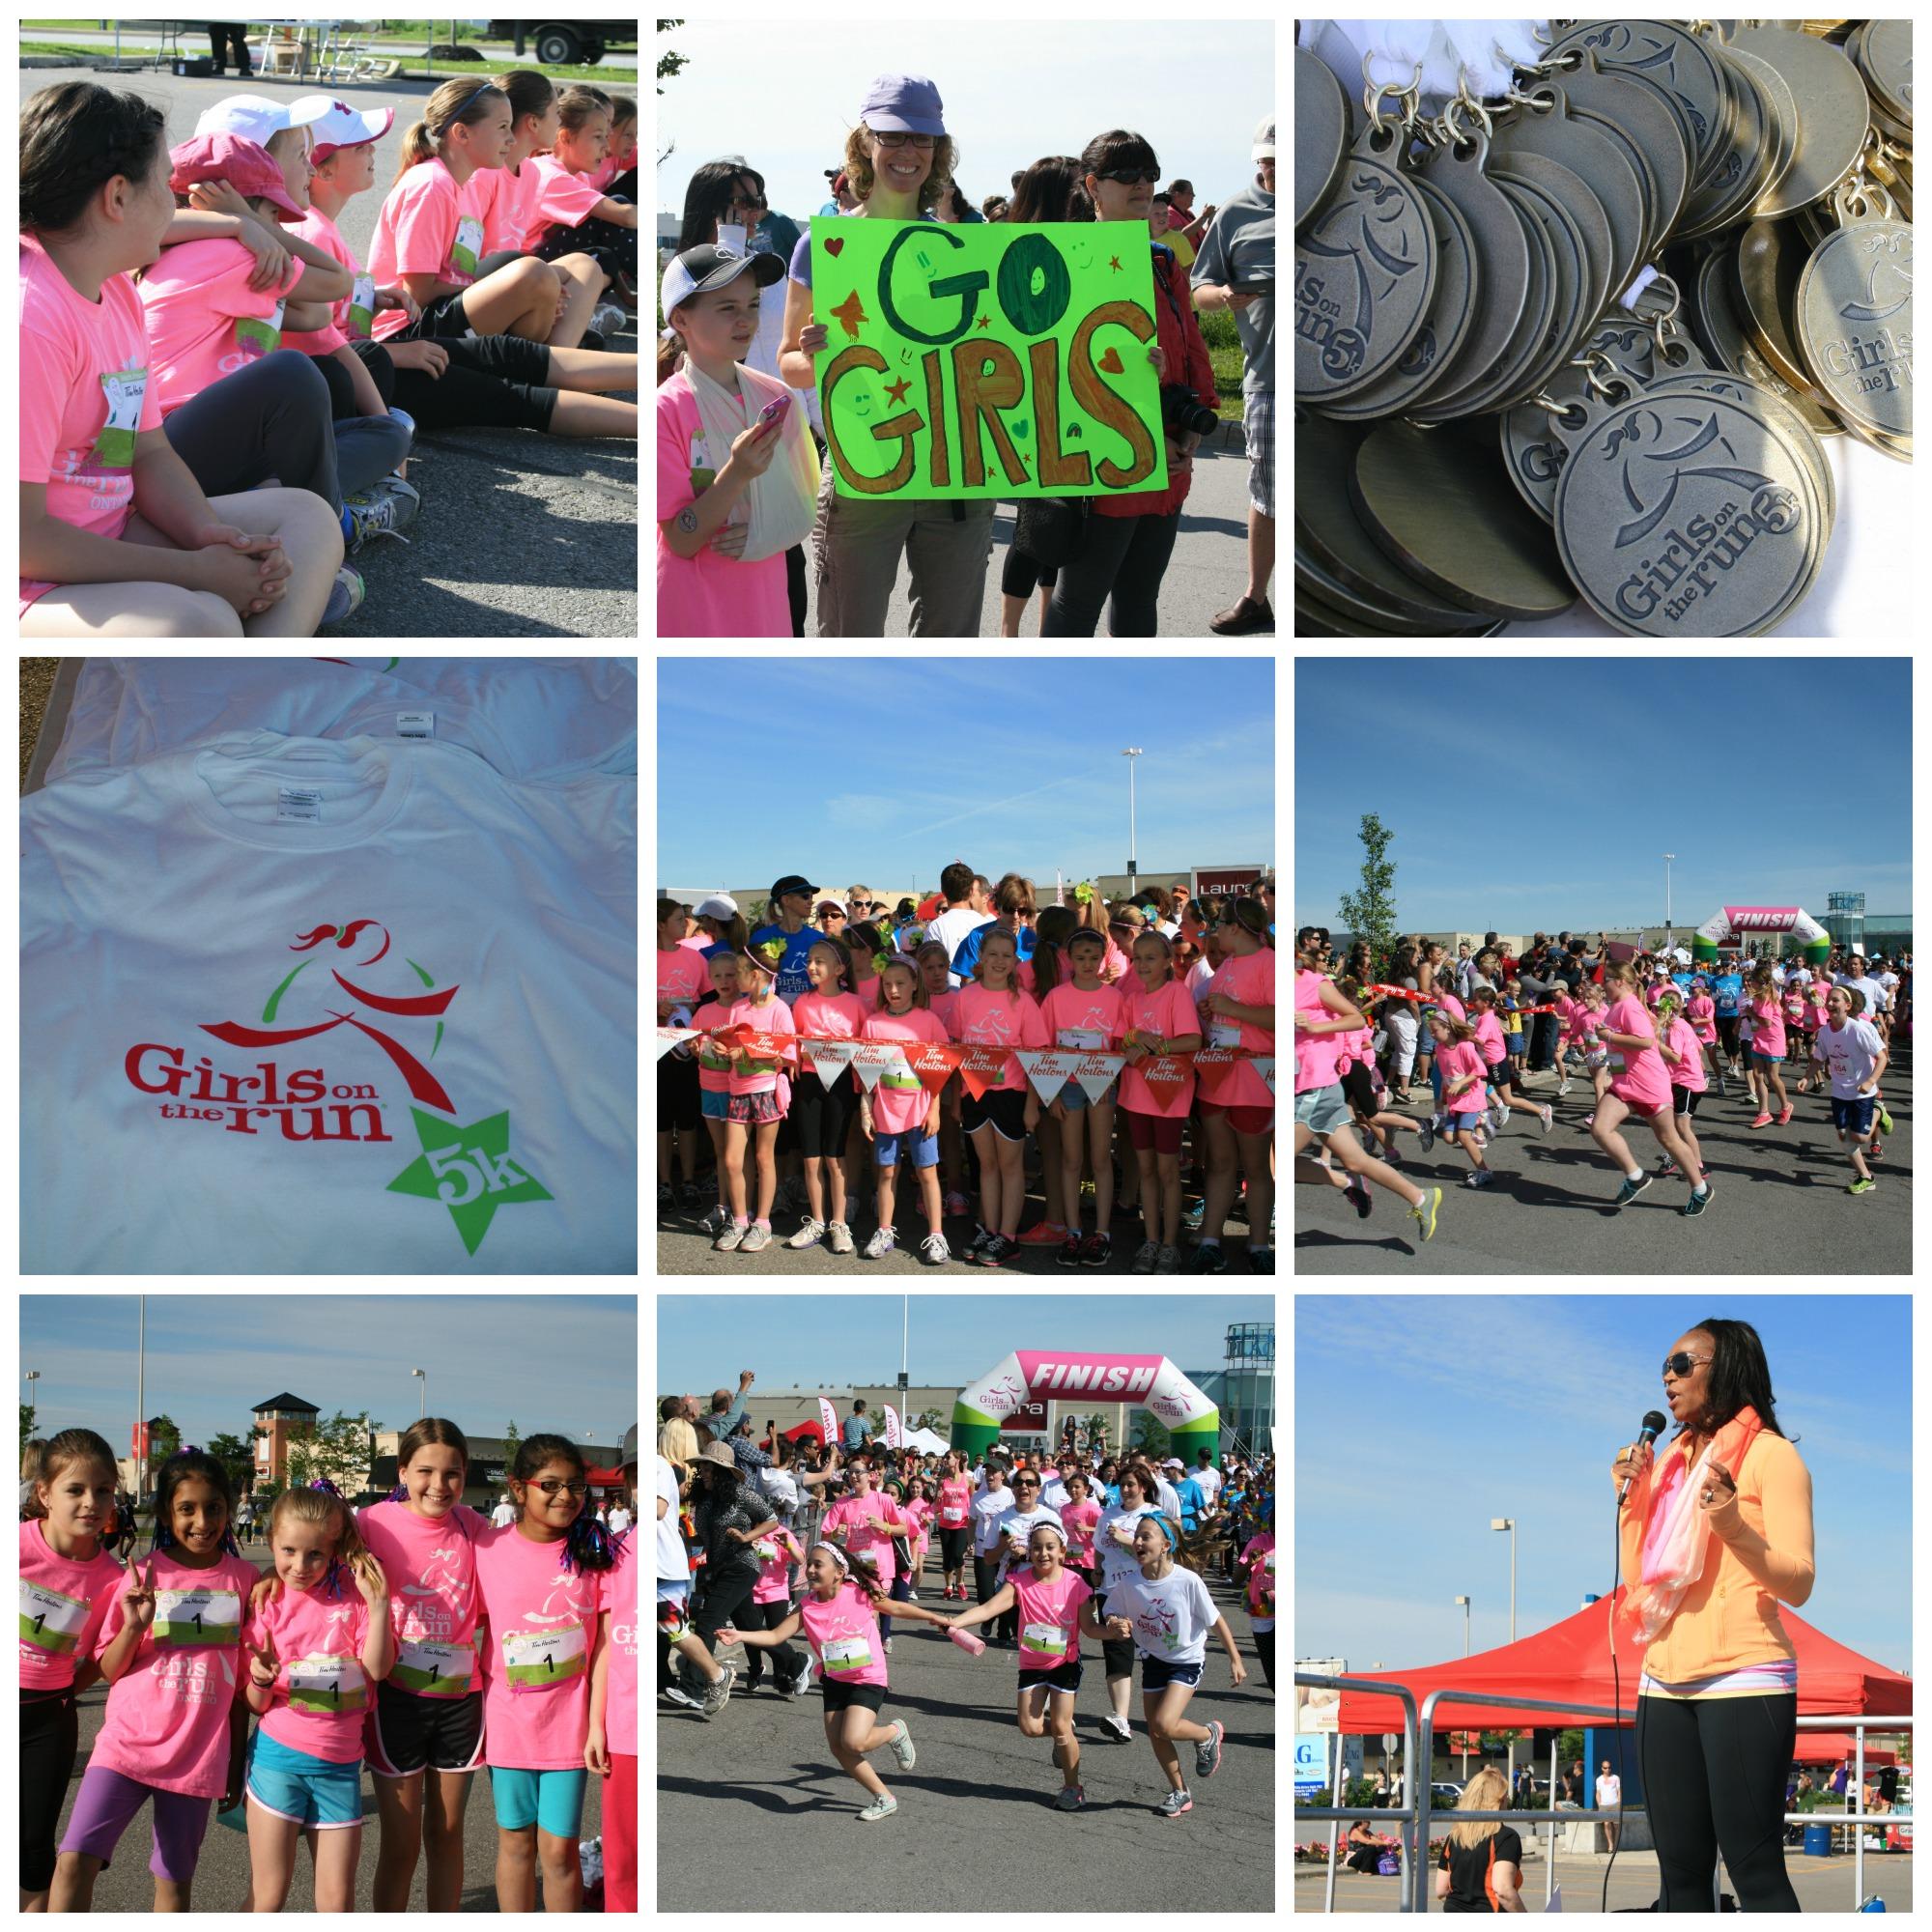 Girls on the run 2013